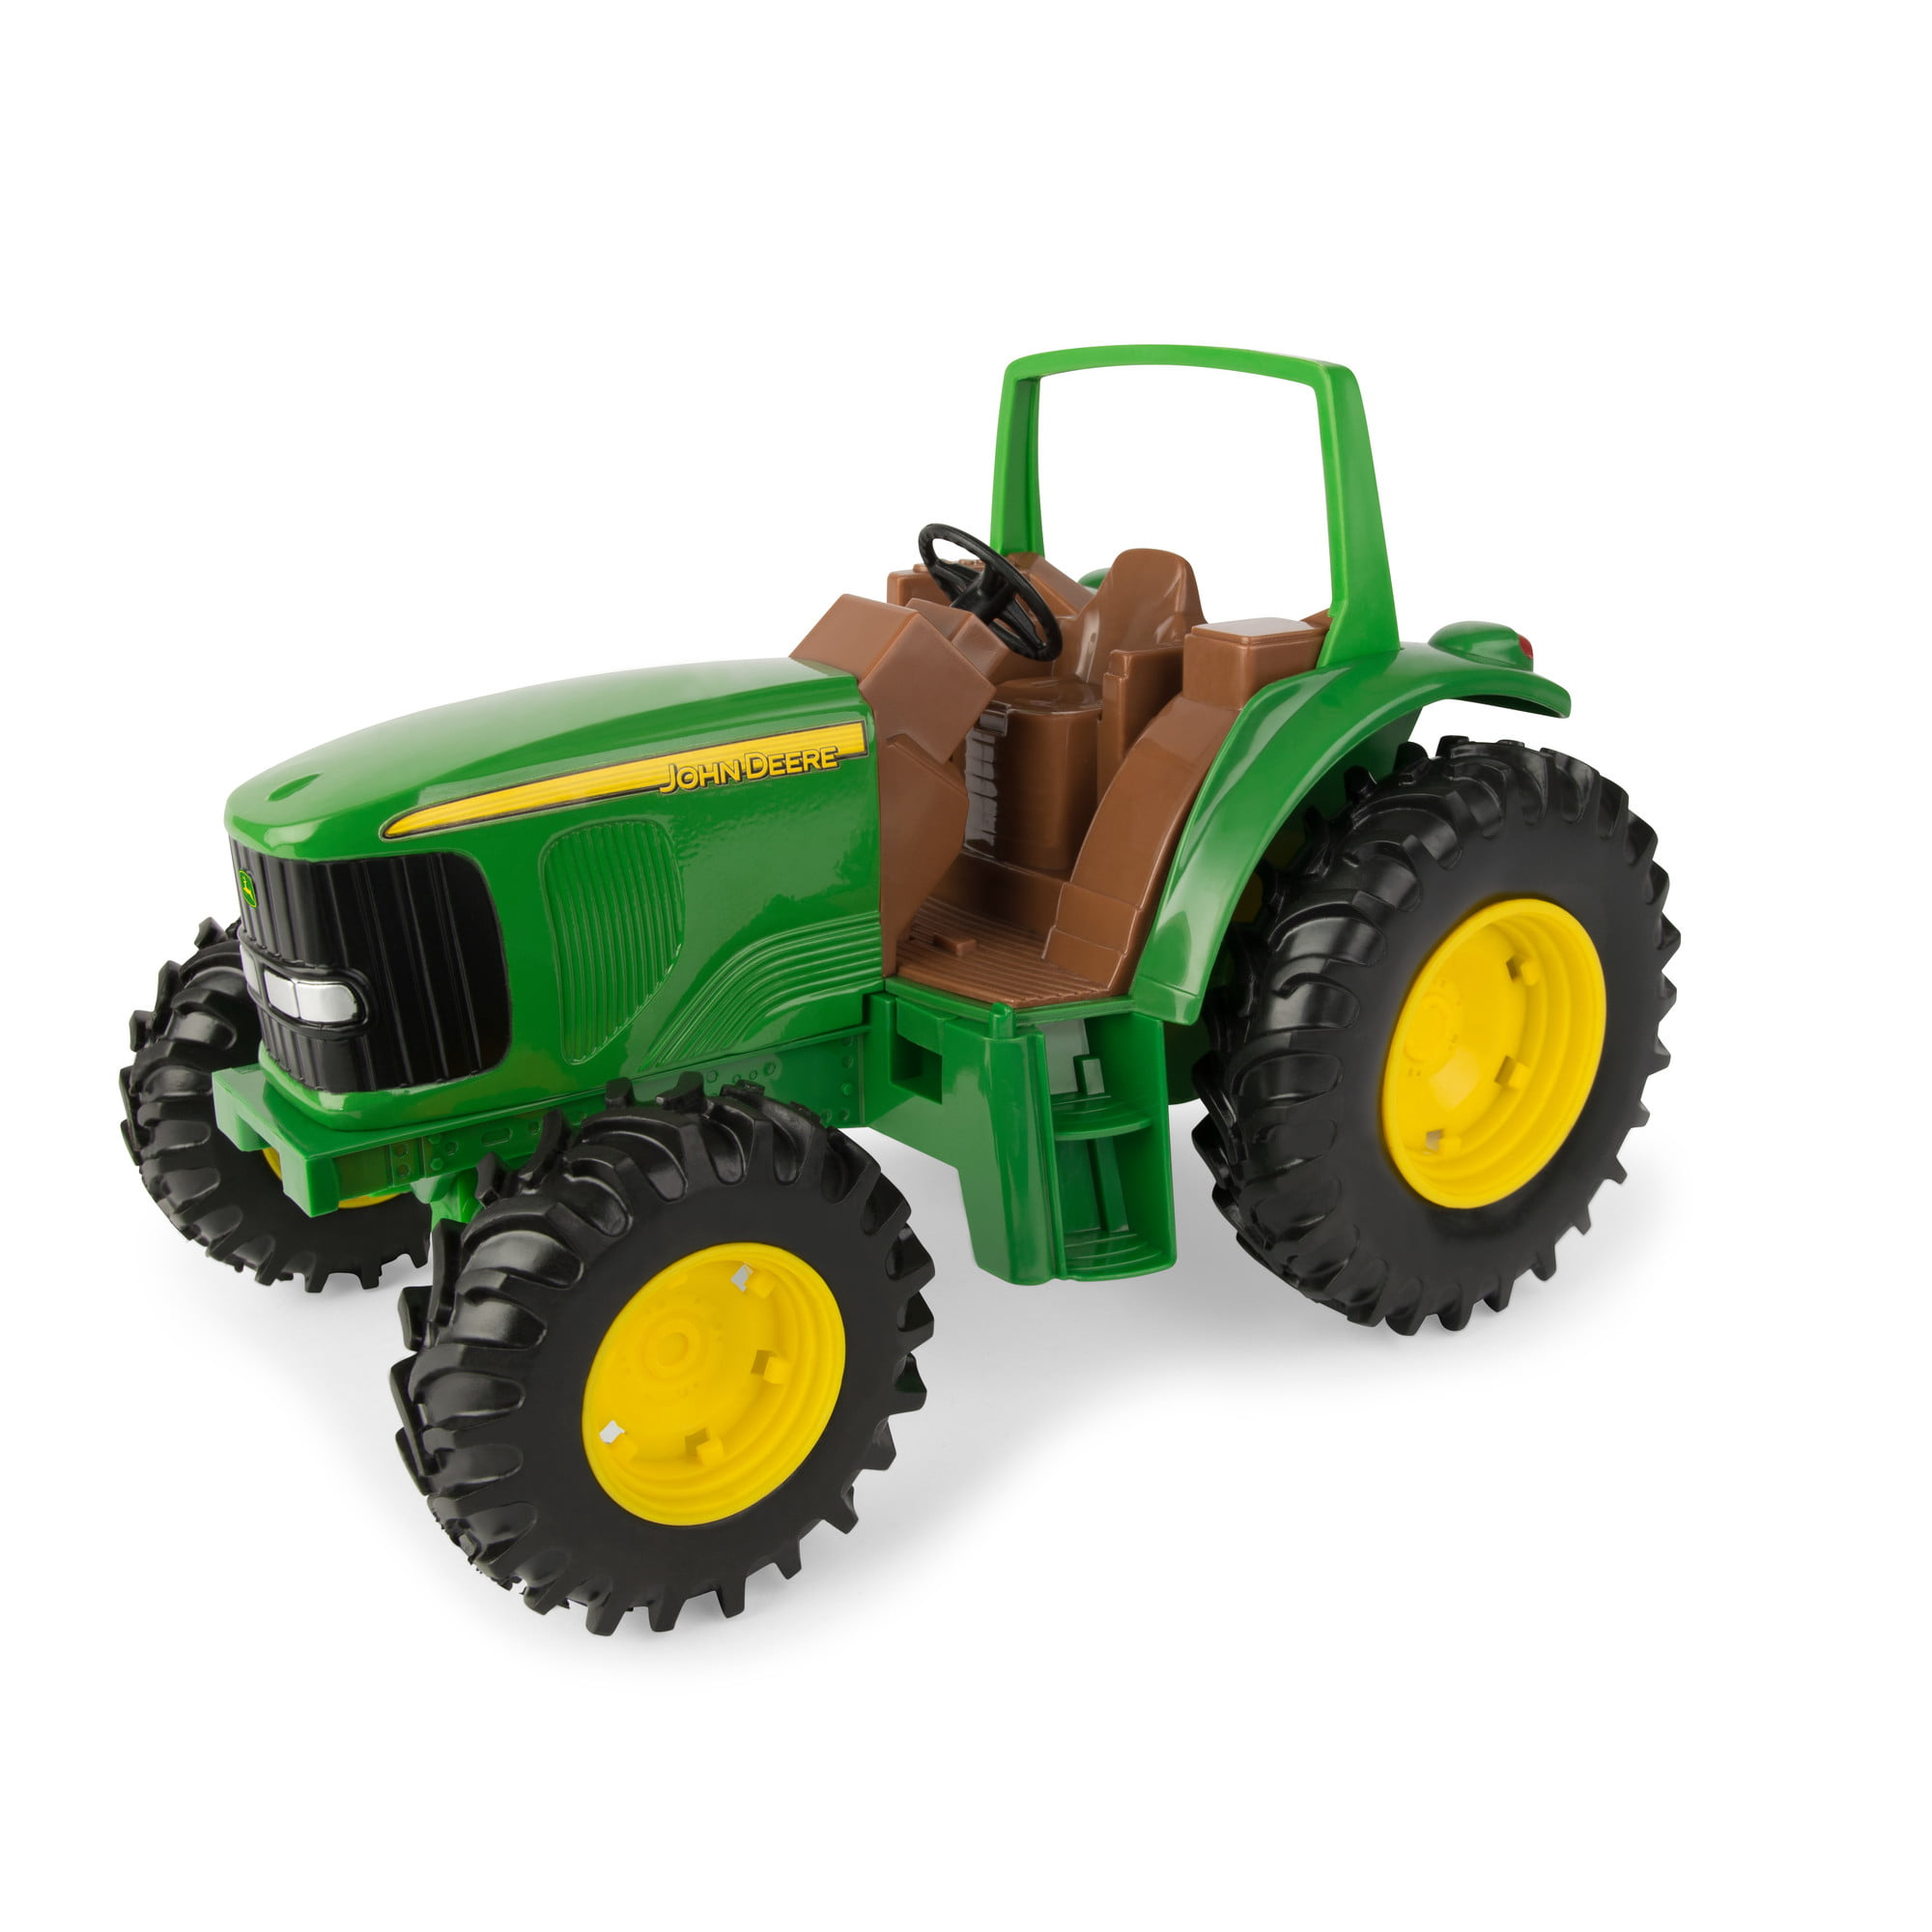 John Deere Tough Tractor Toy, Die-Cast 6930 Tractor, Build Sandbox Tough, 1:16 Scale